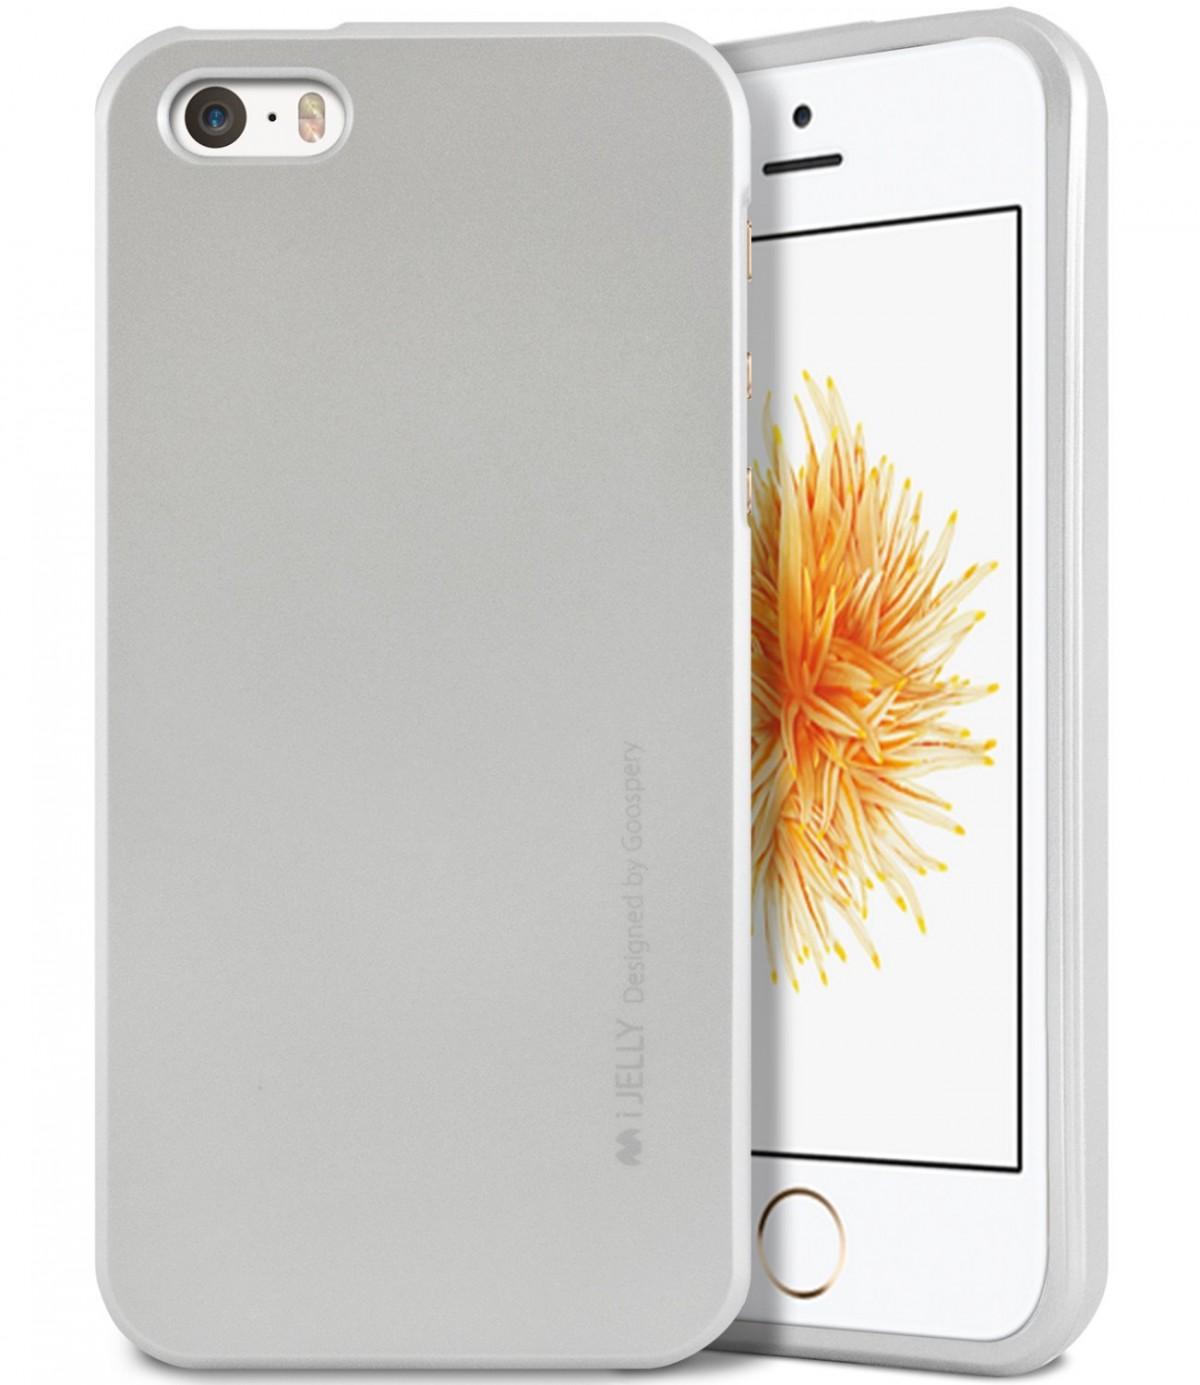 Silikonový obal / kryt iJelly Metal Goospery Mercury Apple iPhone SE / 5s / 5 - Metalicky stříbrný